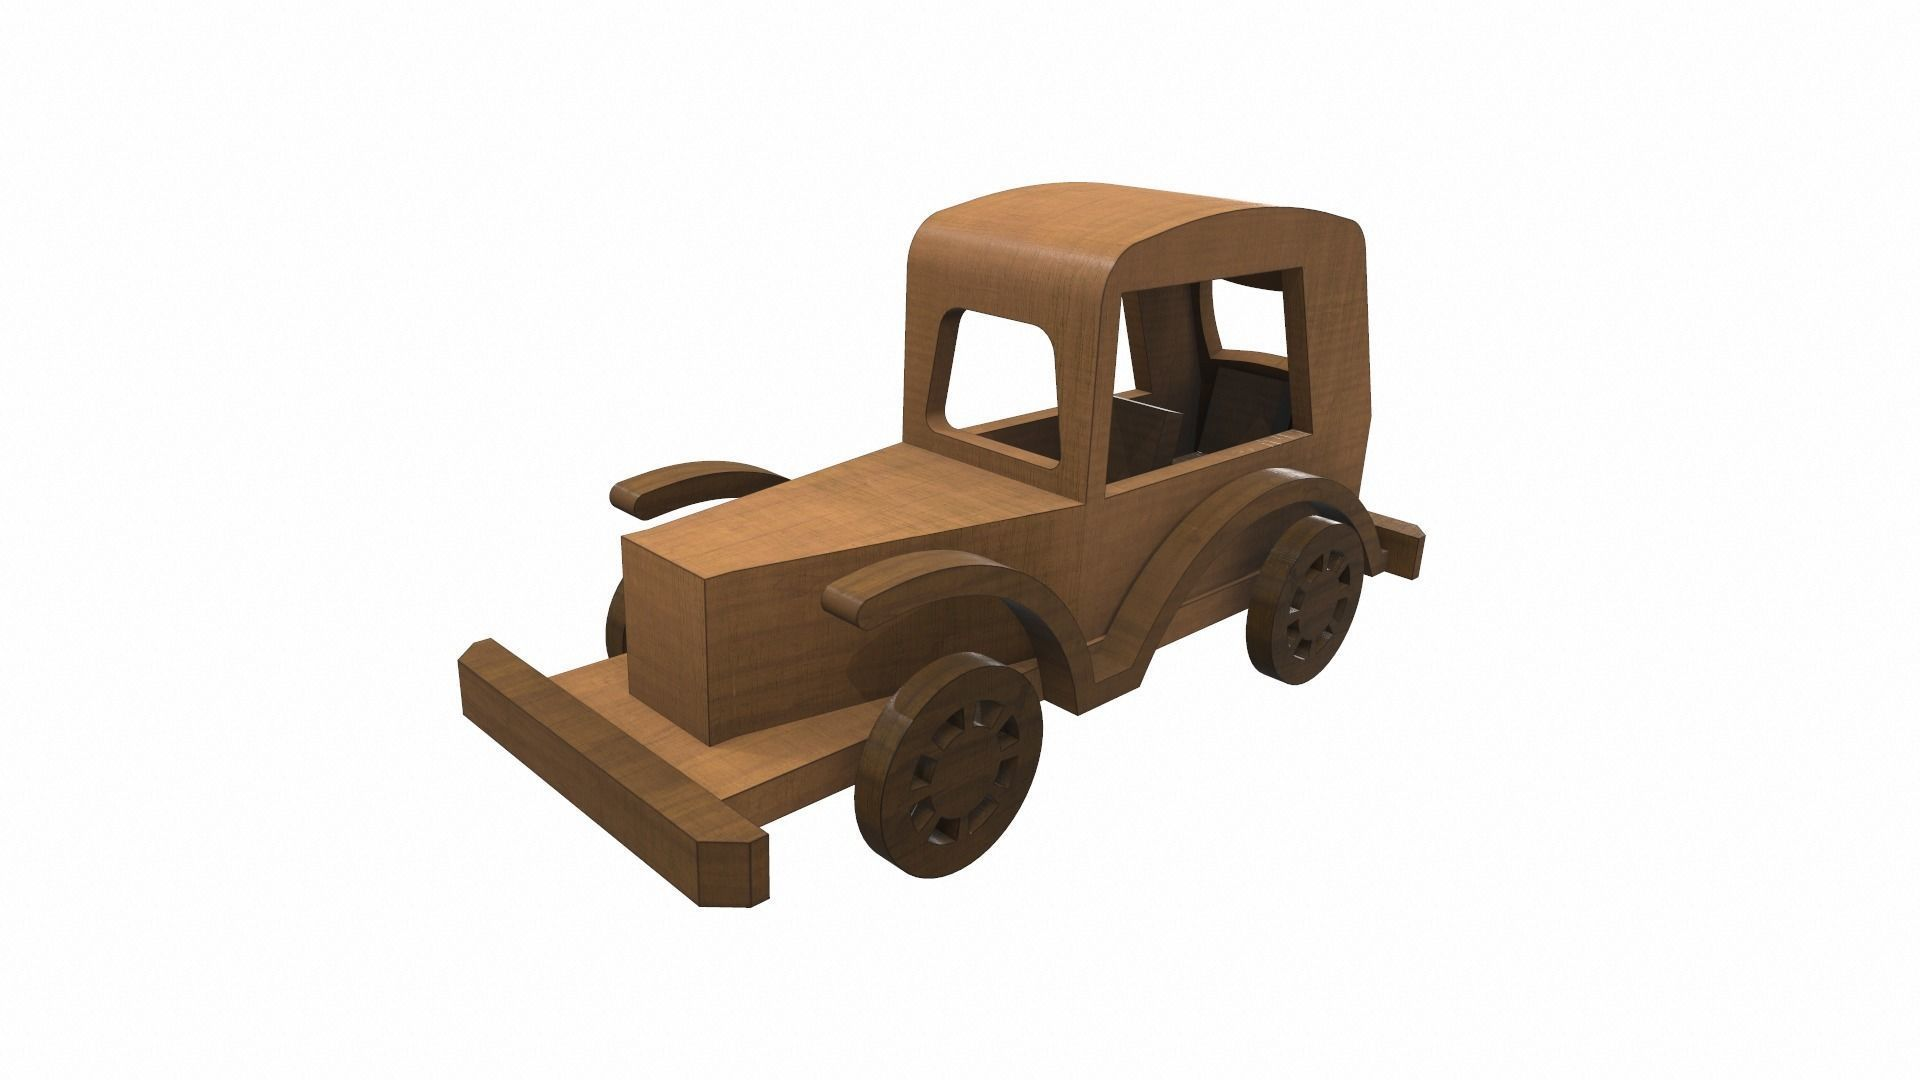 Wooden car toy retro 5